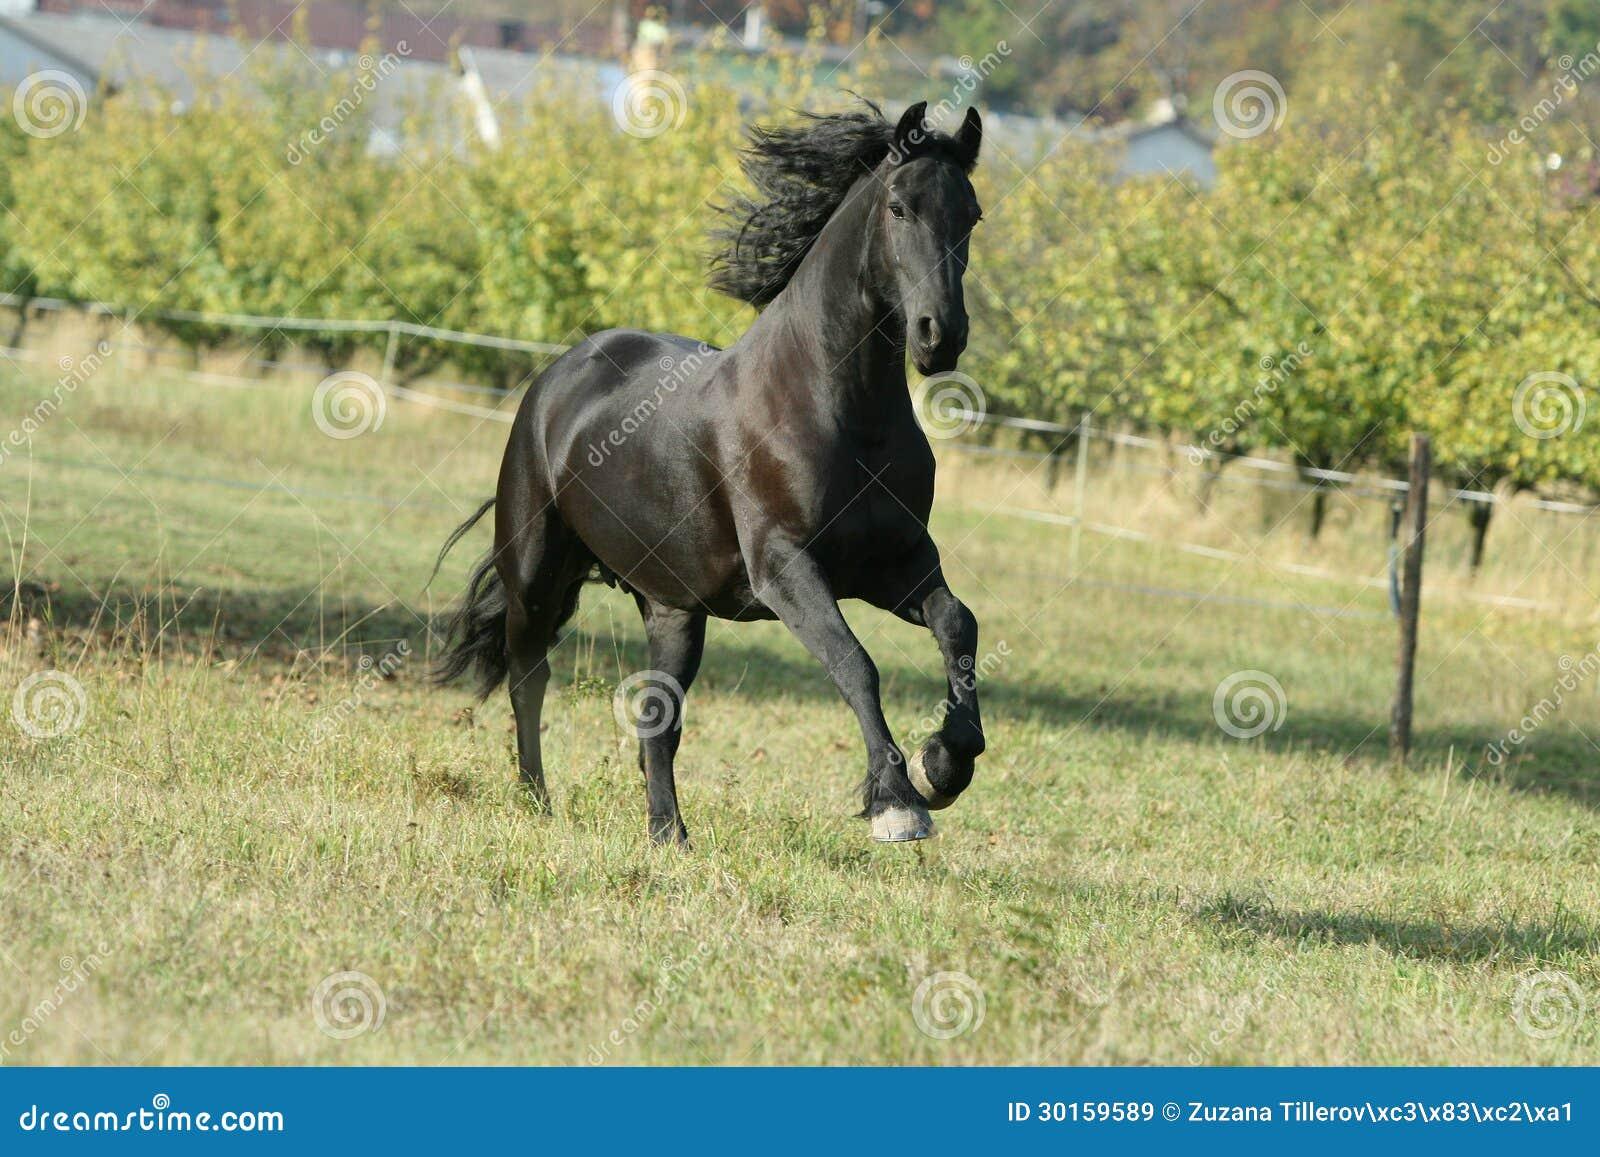 Running Friesian horse